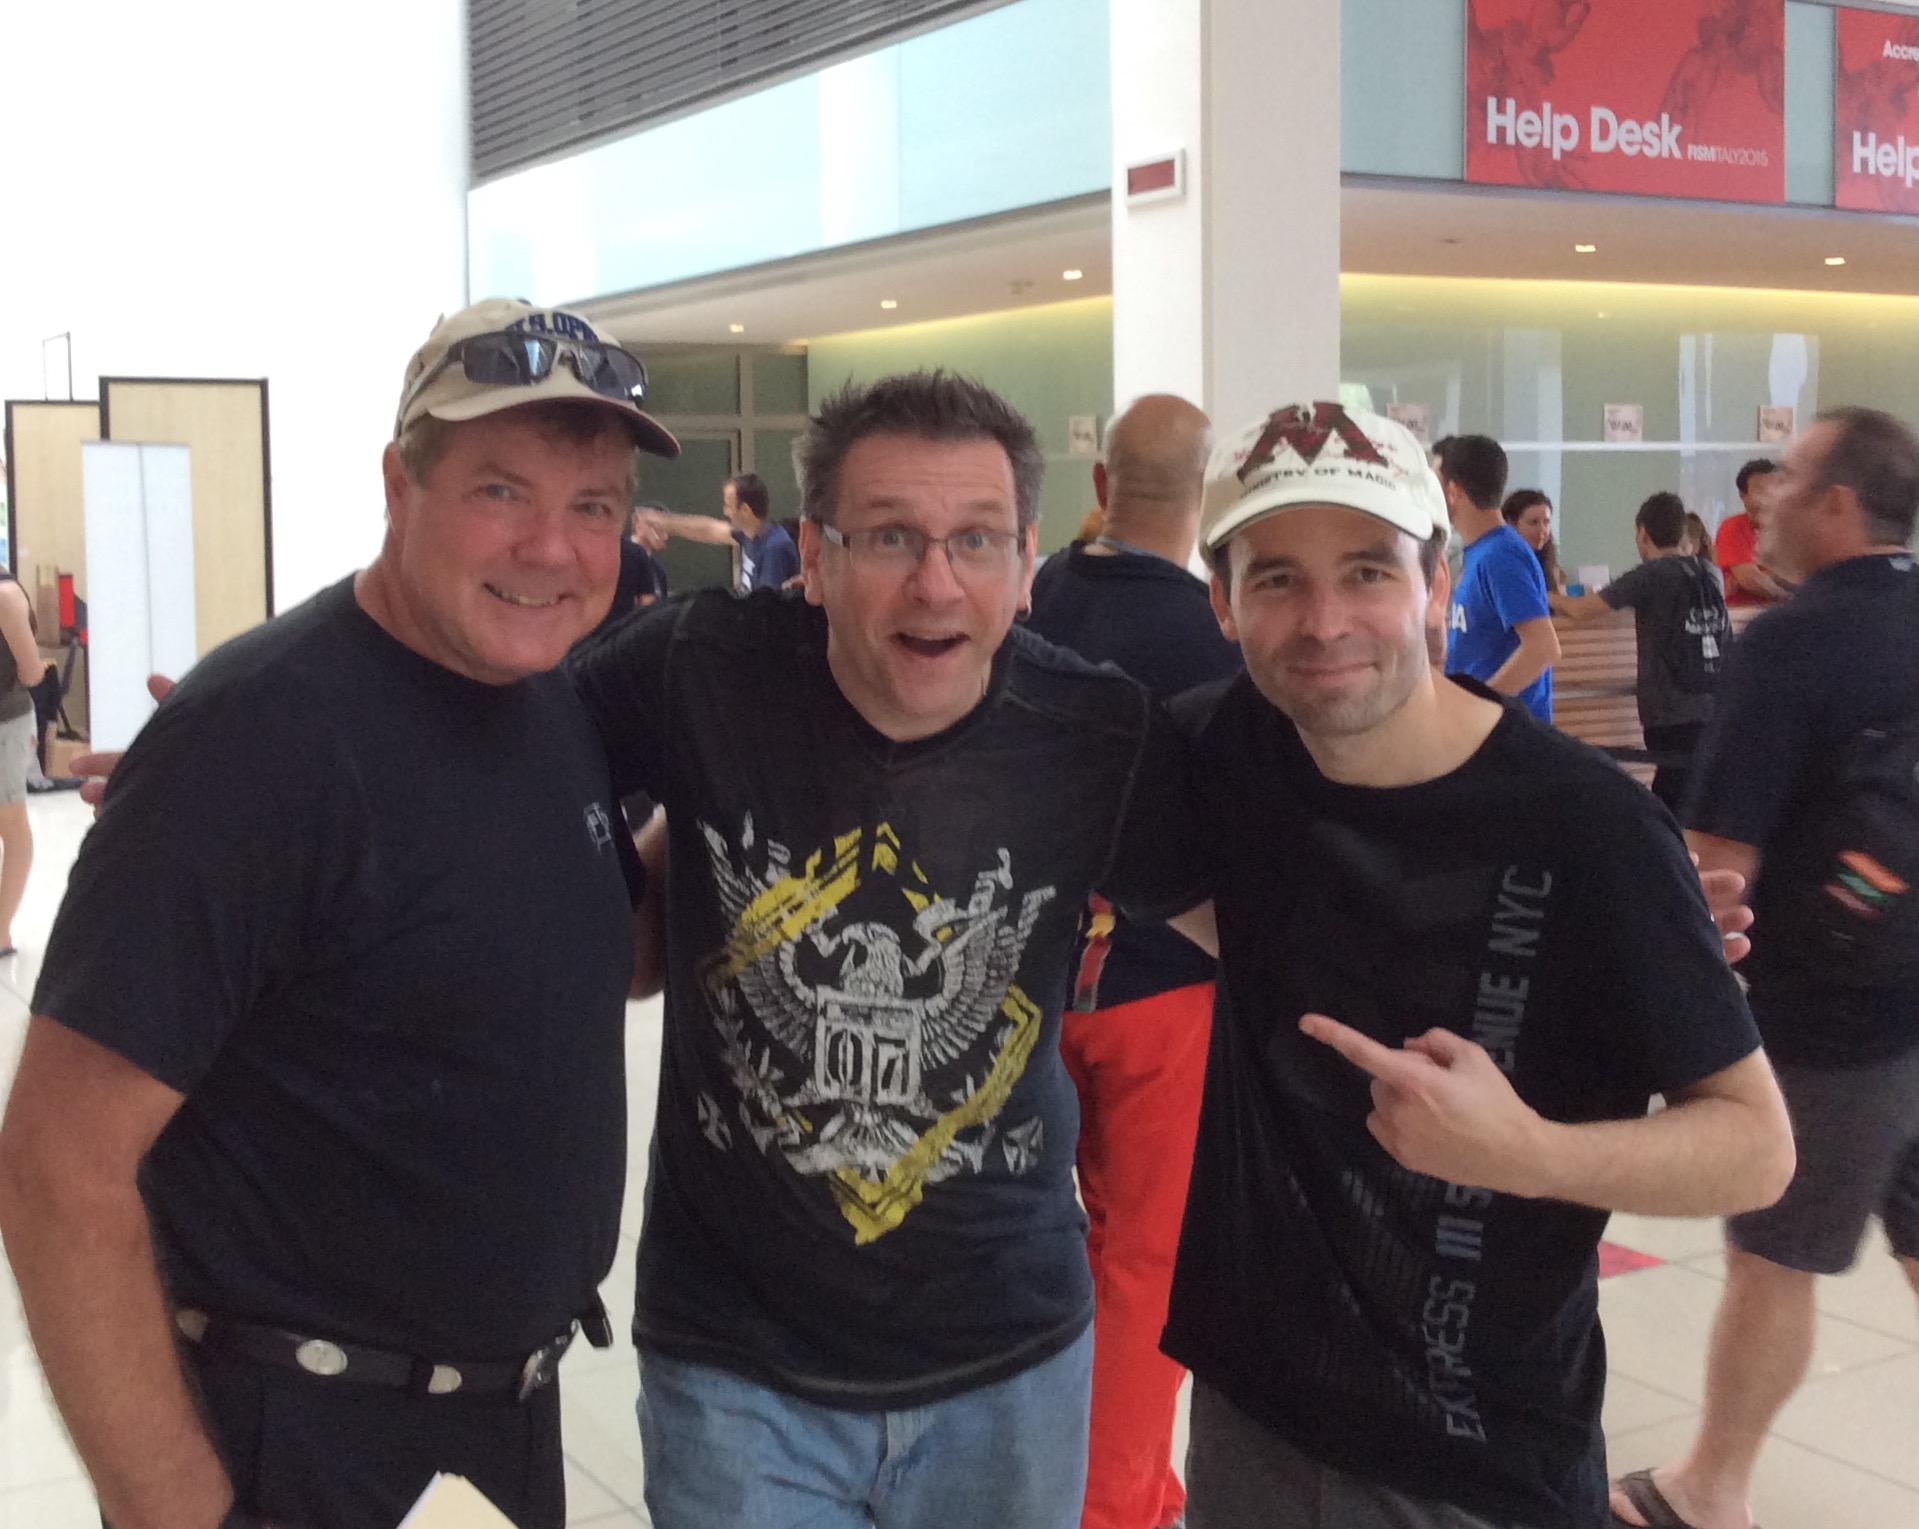 Scott, Shawn Farquhar & Craig Mitchell